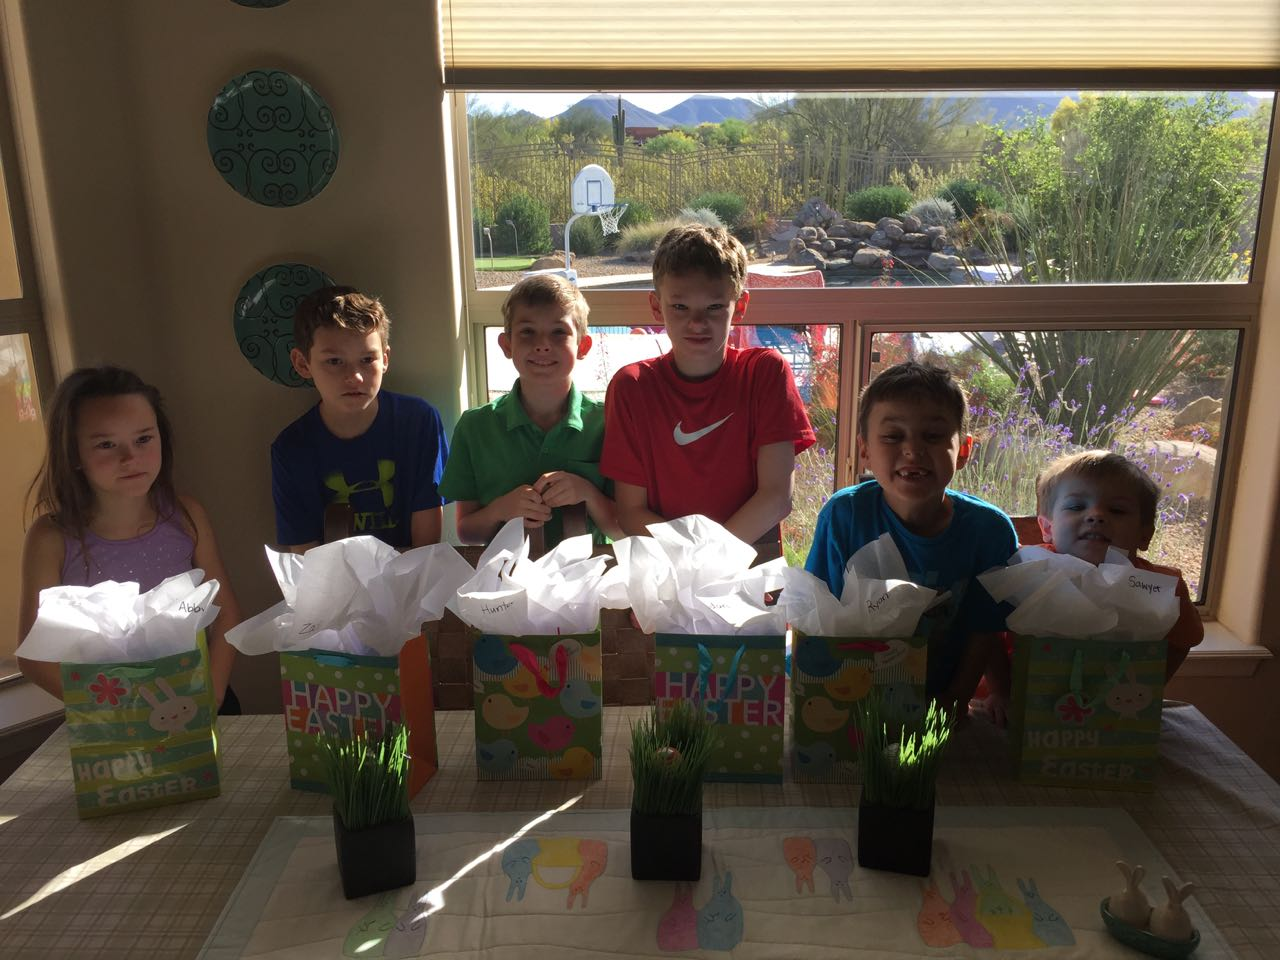 Easter Sunday in Scottsdale AZ